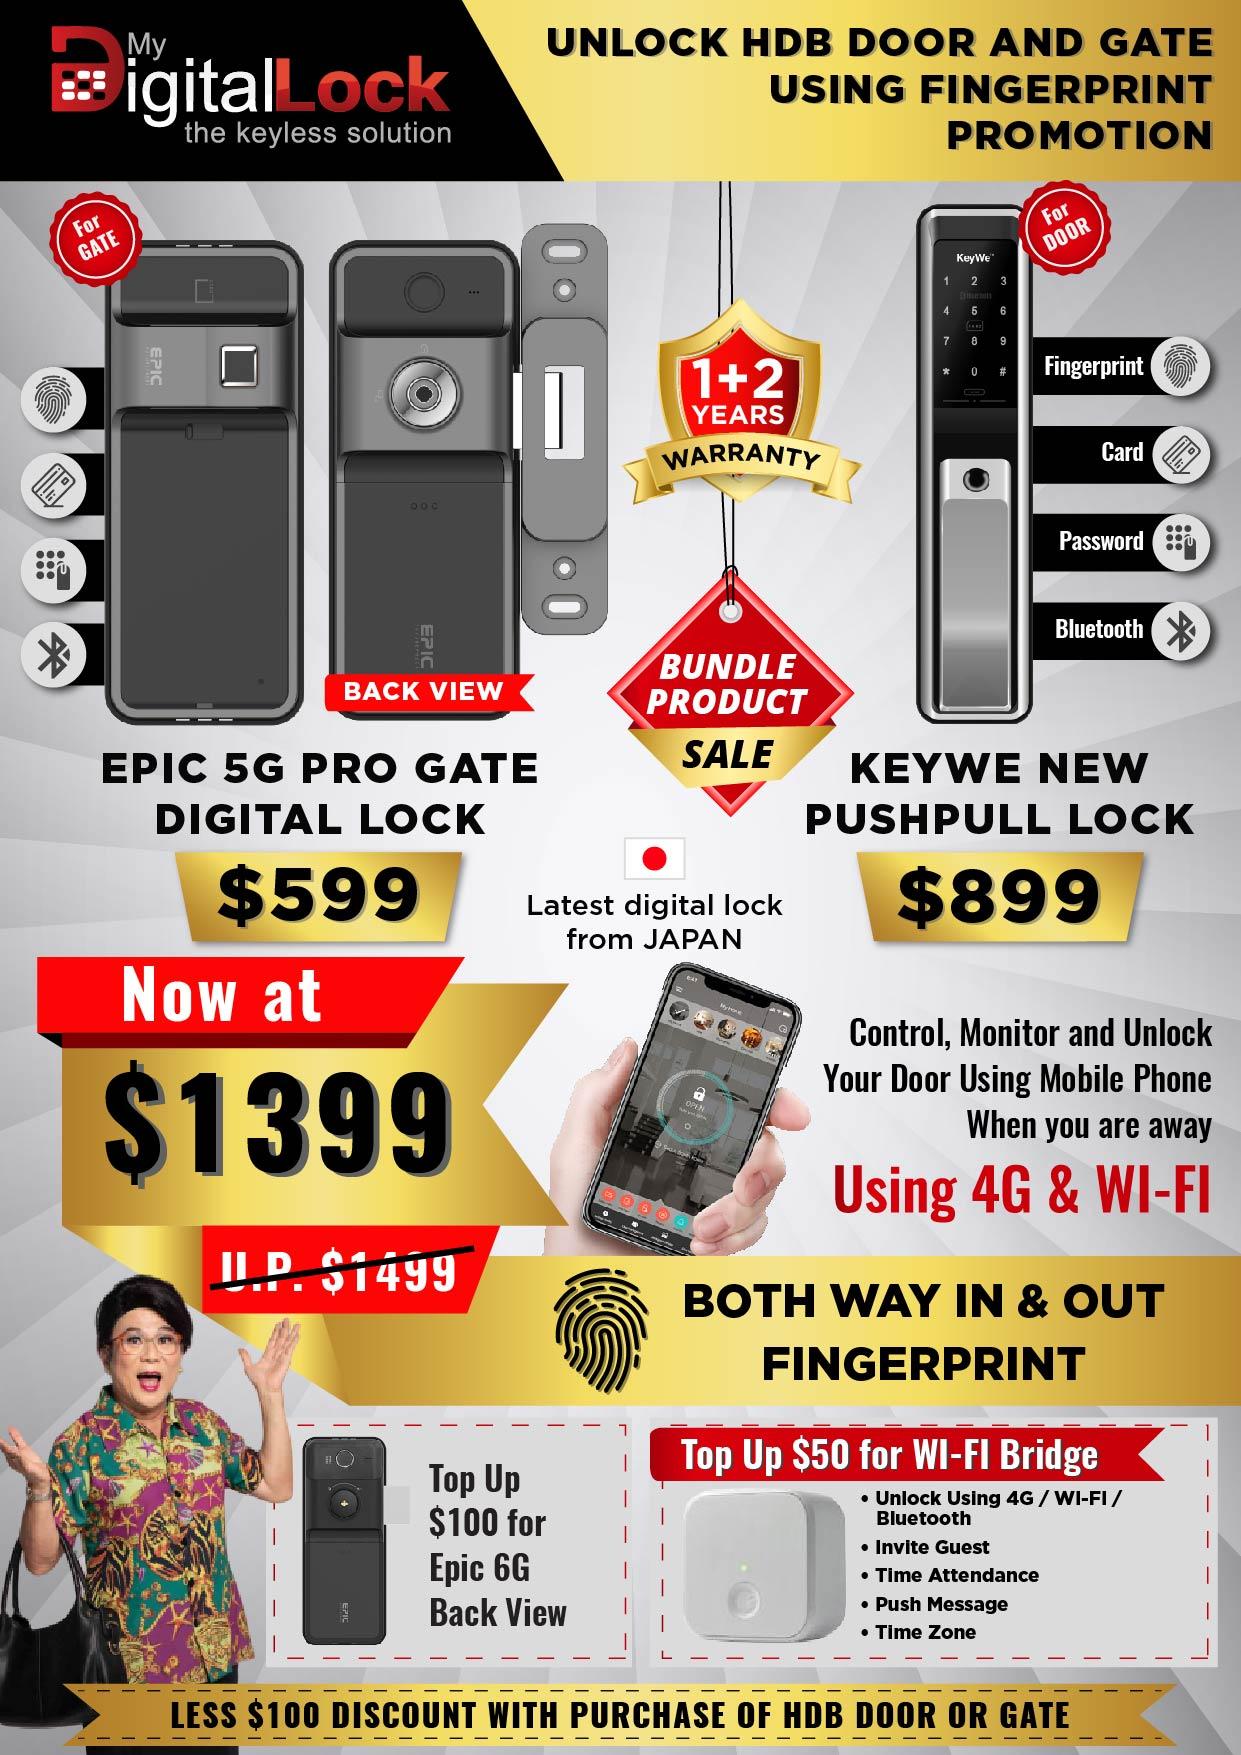 EPIC-5-PRO-Gate-Digital-Lock-and-KeyWe-Black-Push-Pull-Door-Lock-Promotion-2020